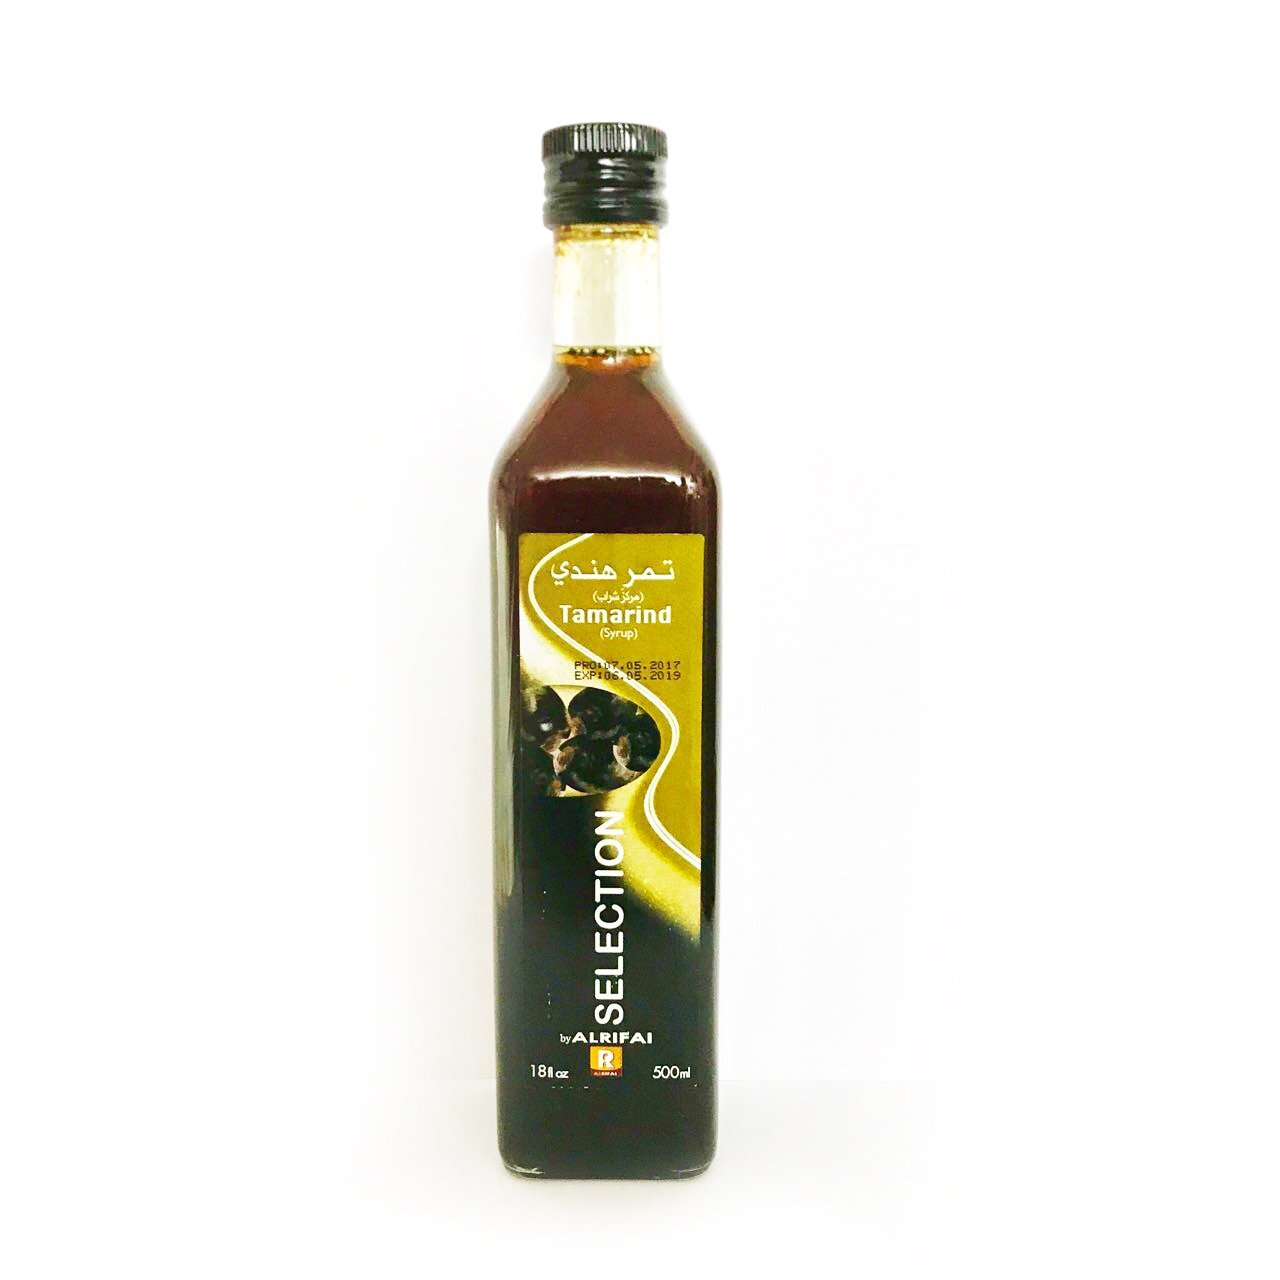 R AL RIFAI Tamarind Syrup